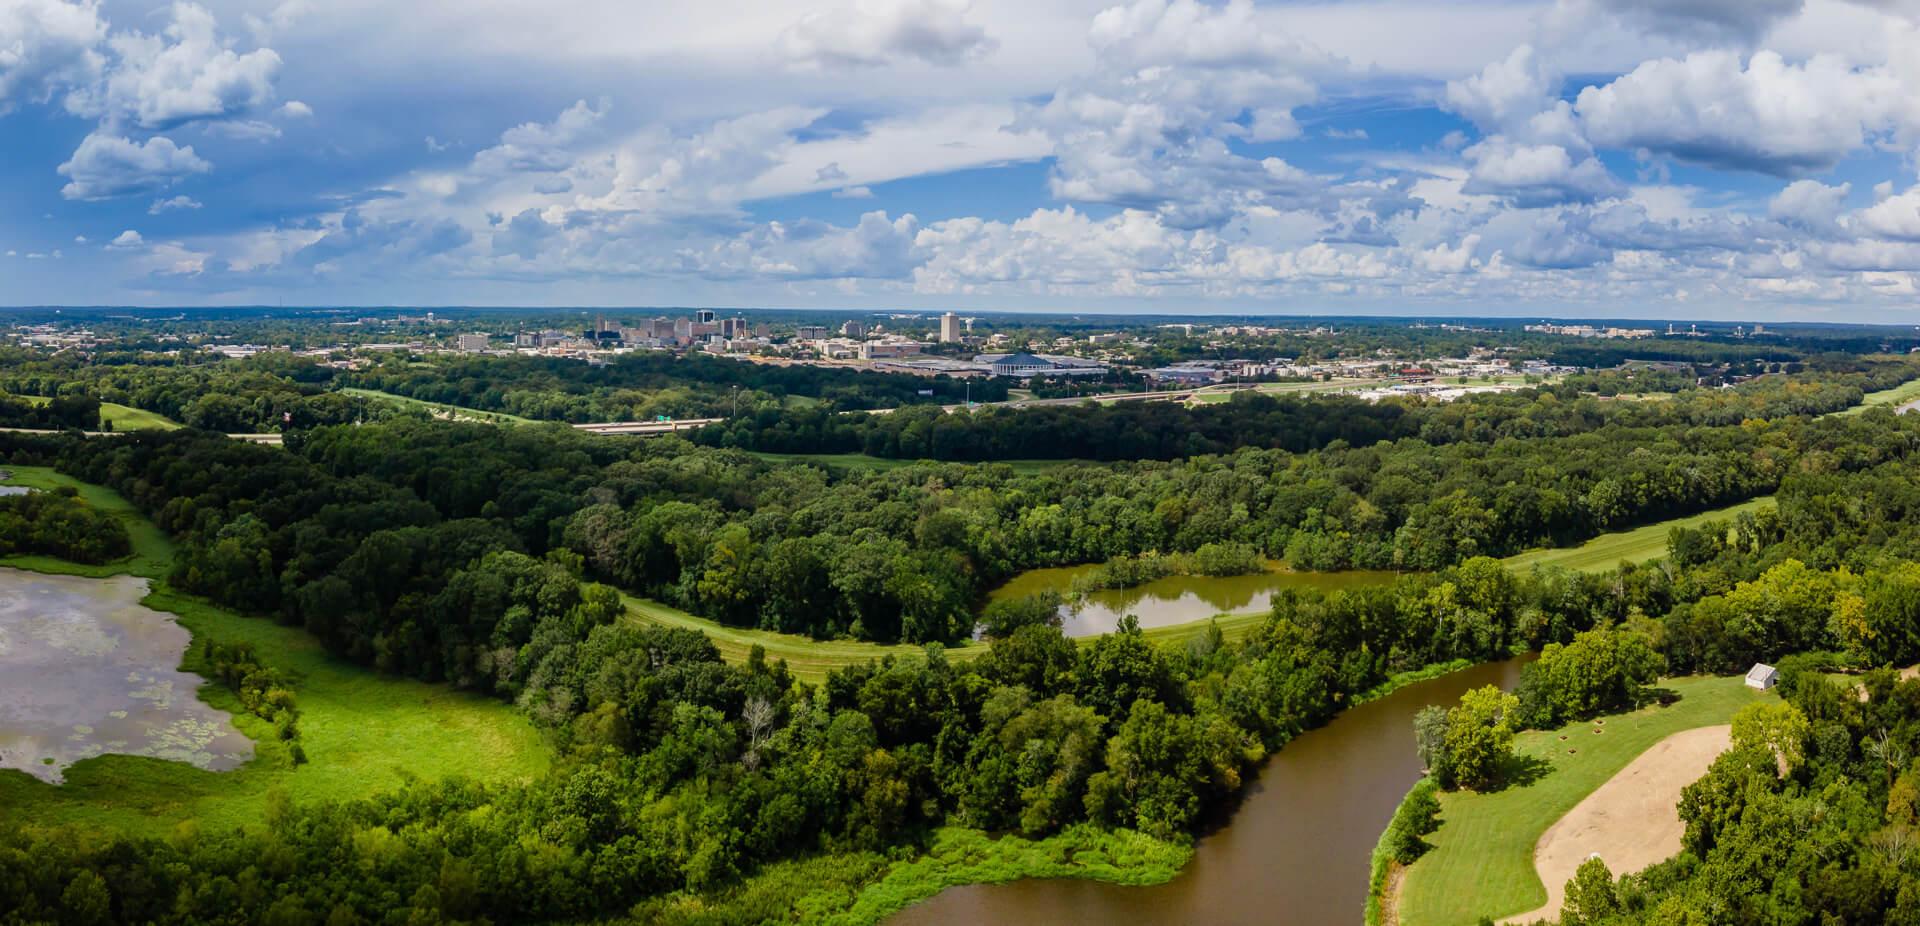 Jackson, Mississippi view